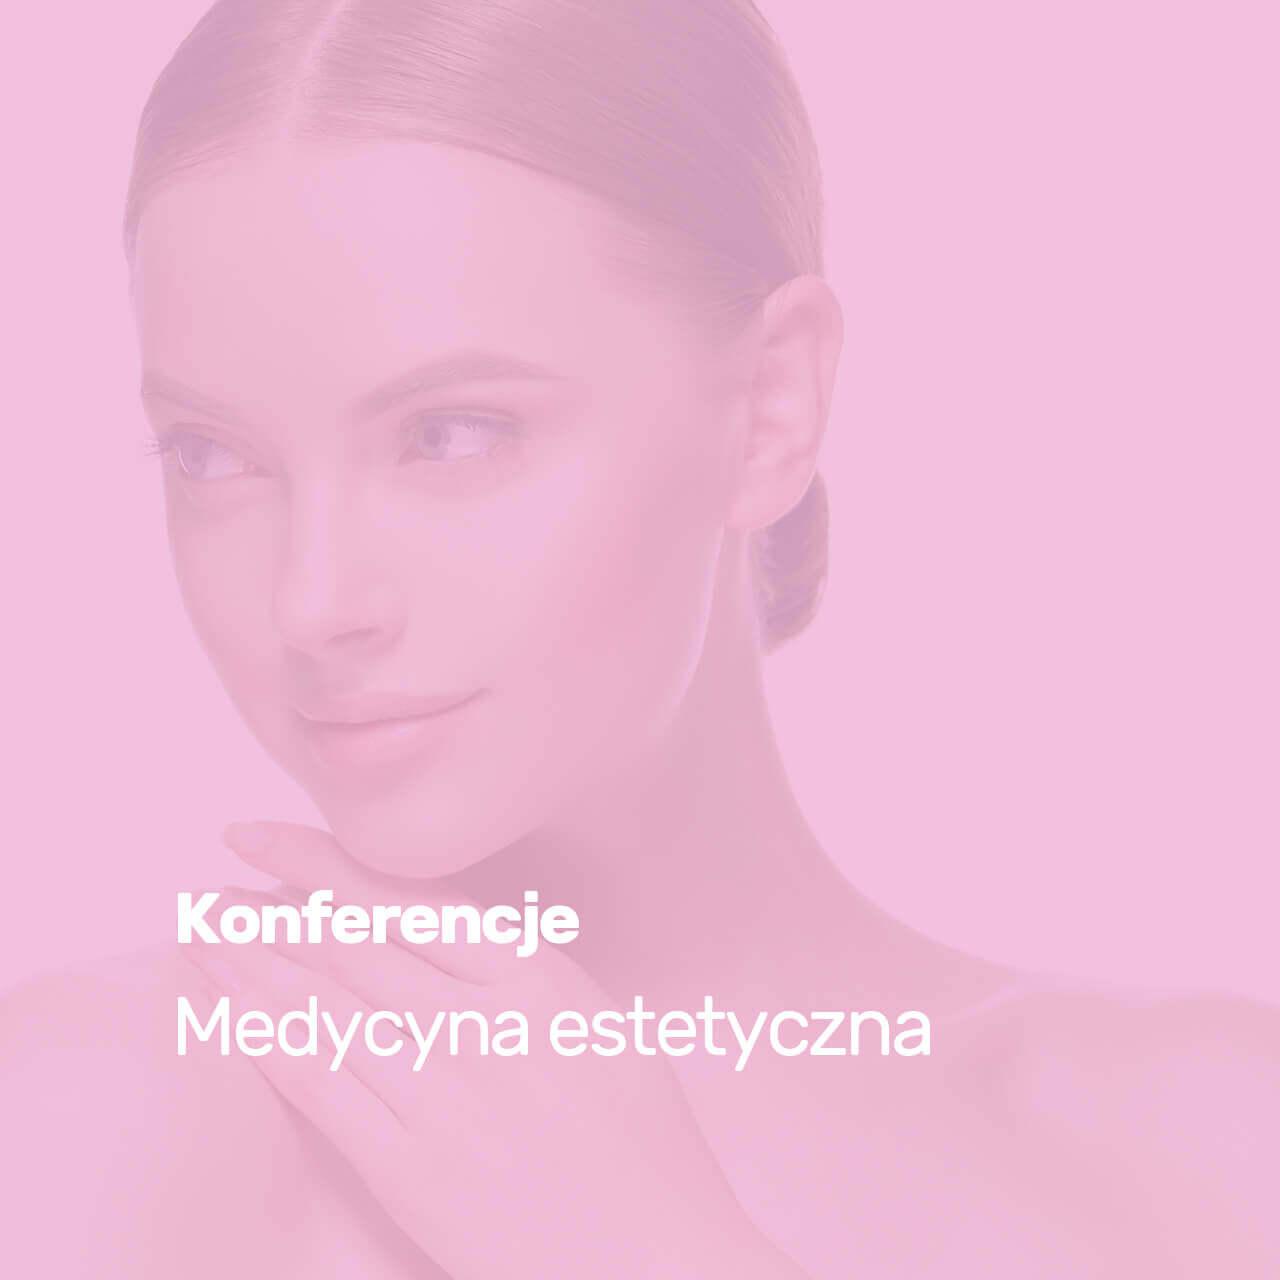 konferencje_kaf